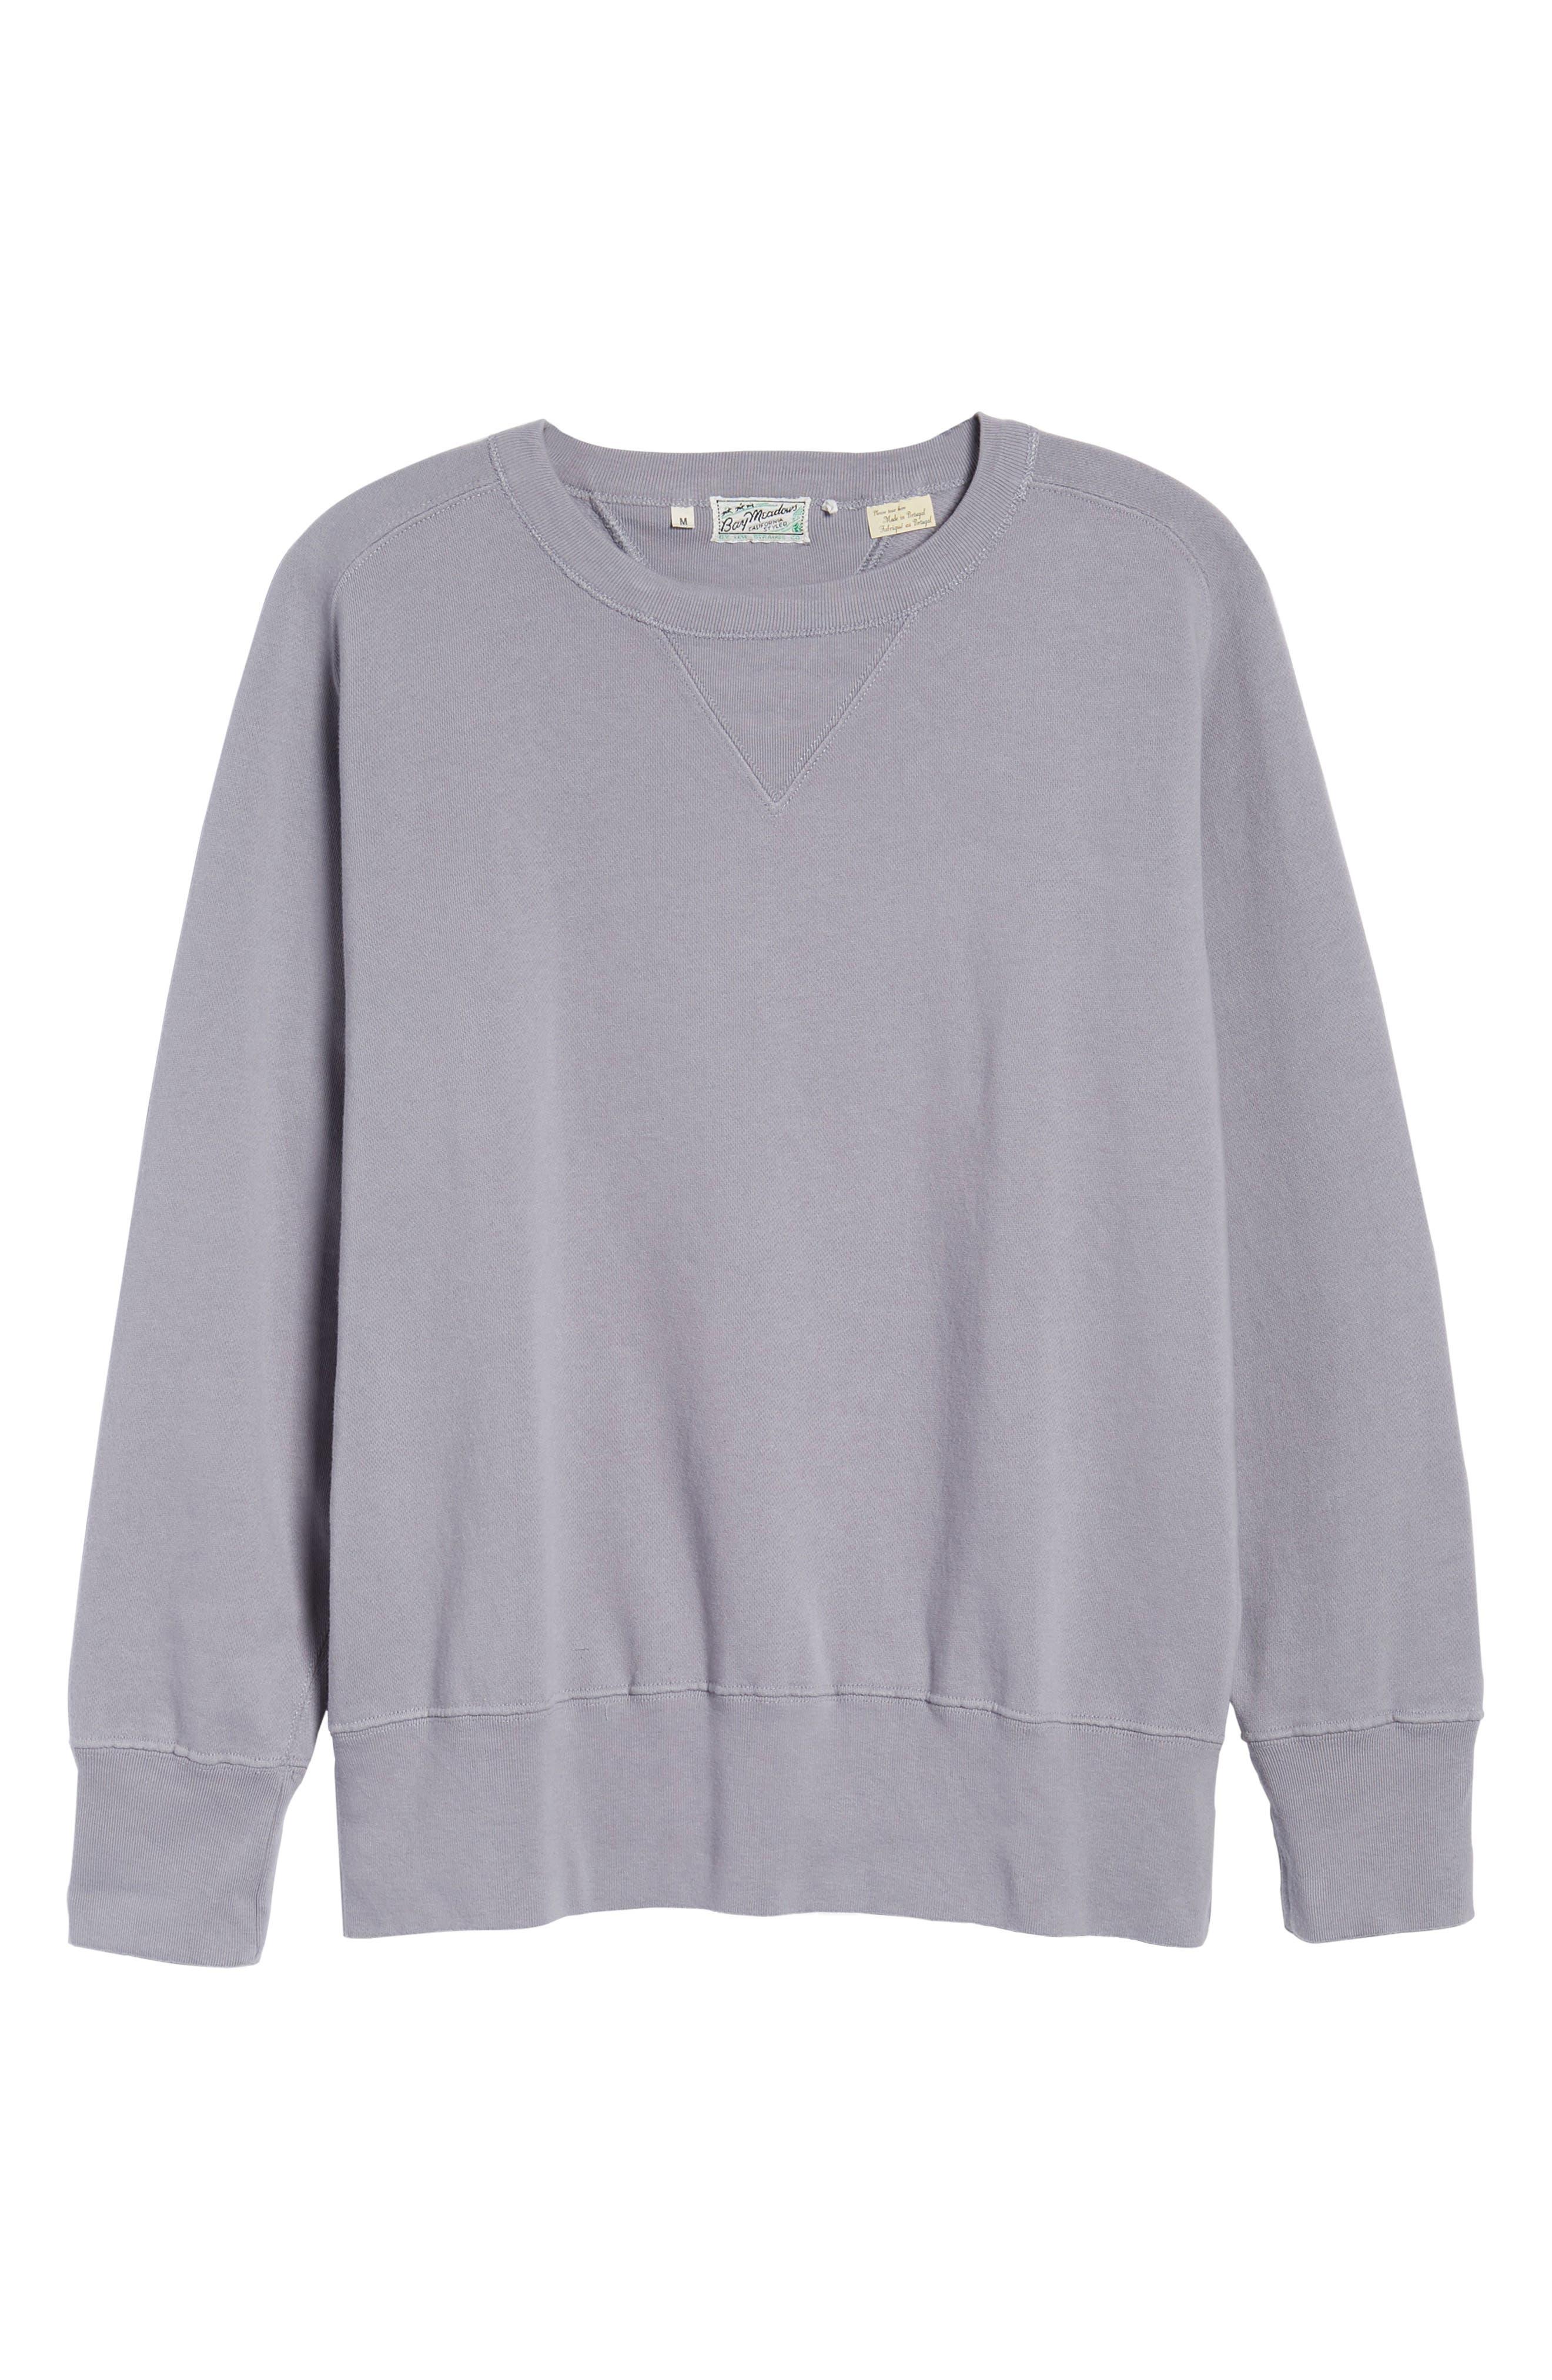 Bay Meadows Sweatshirt,                             Alternate thumbnail 6, color,                             Quiksilver